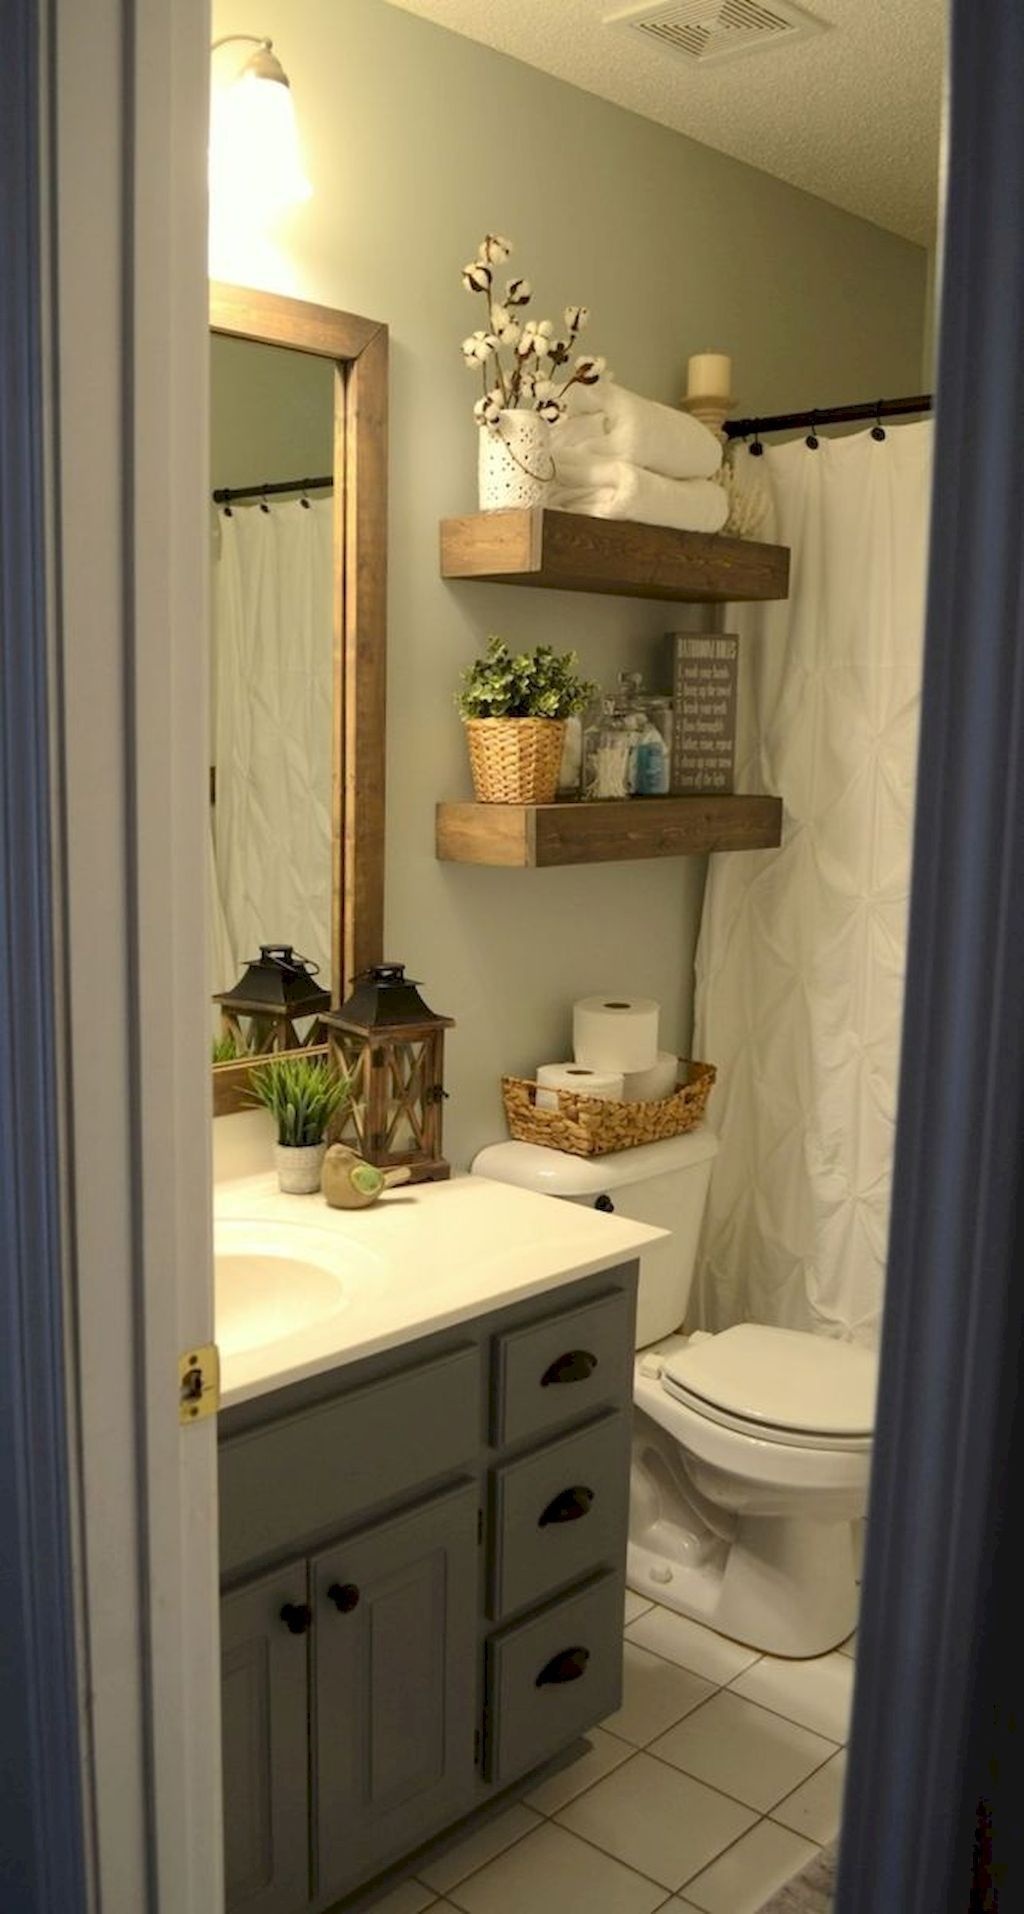 Eclectic Ideas Of Bathroom Wall Decor Purple Bedroom Design Purple Bedrooms And Decorating